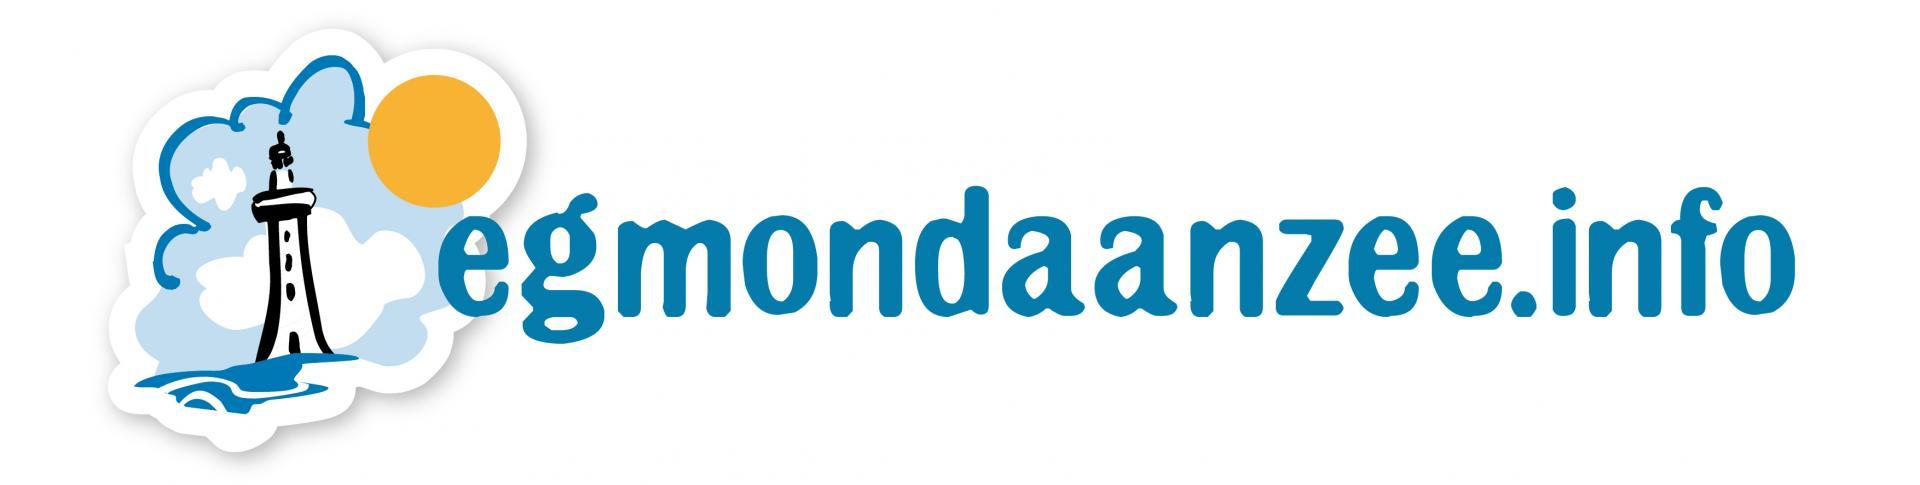 egmondaanzee.info